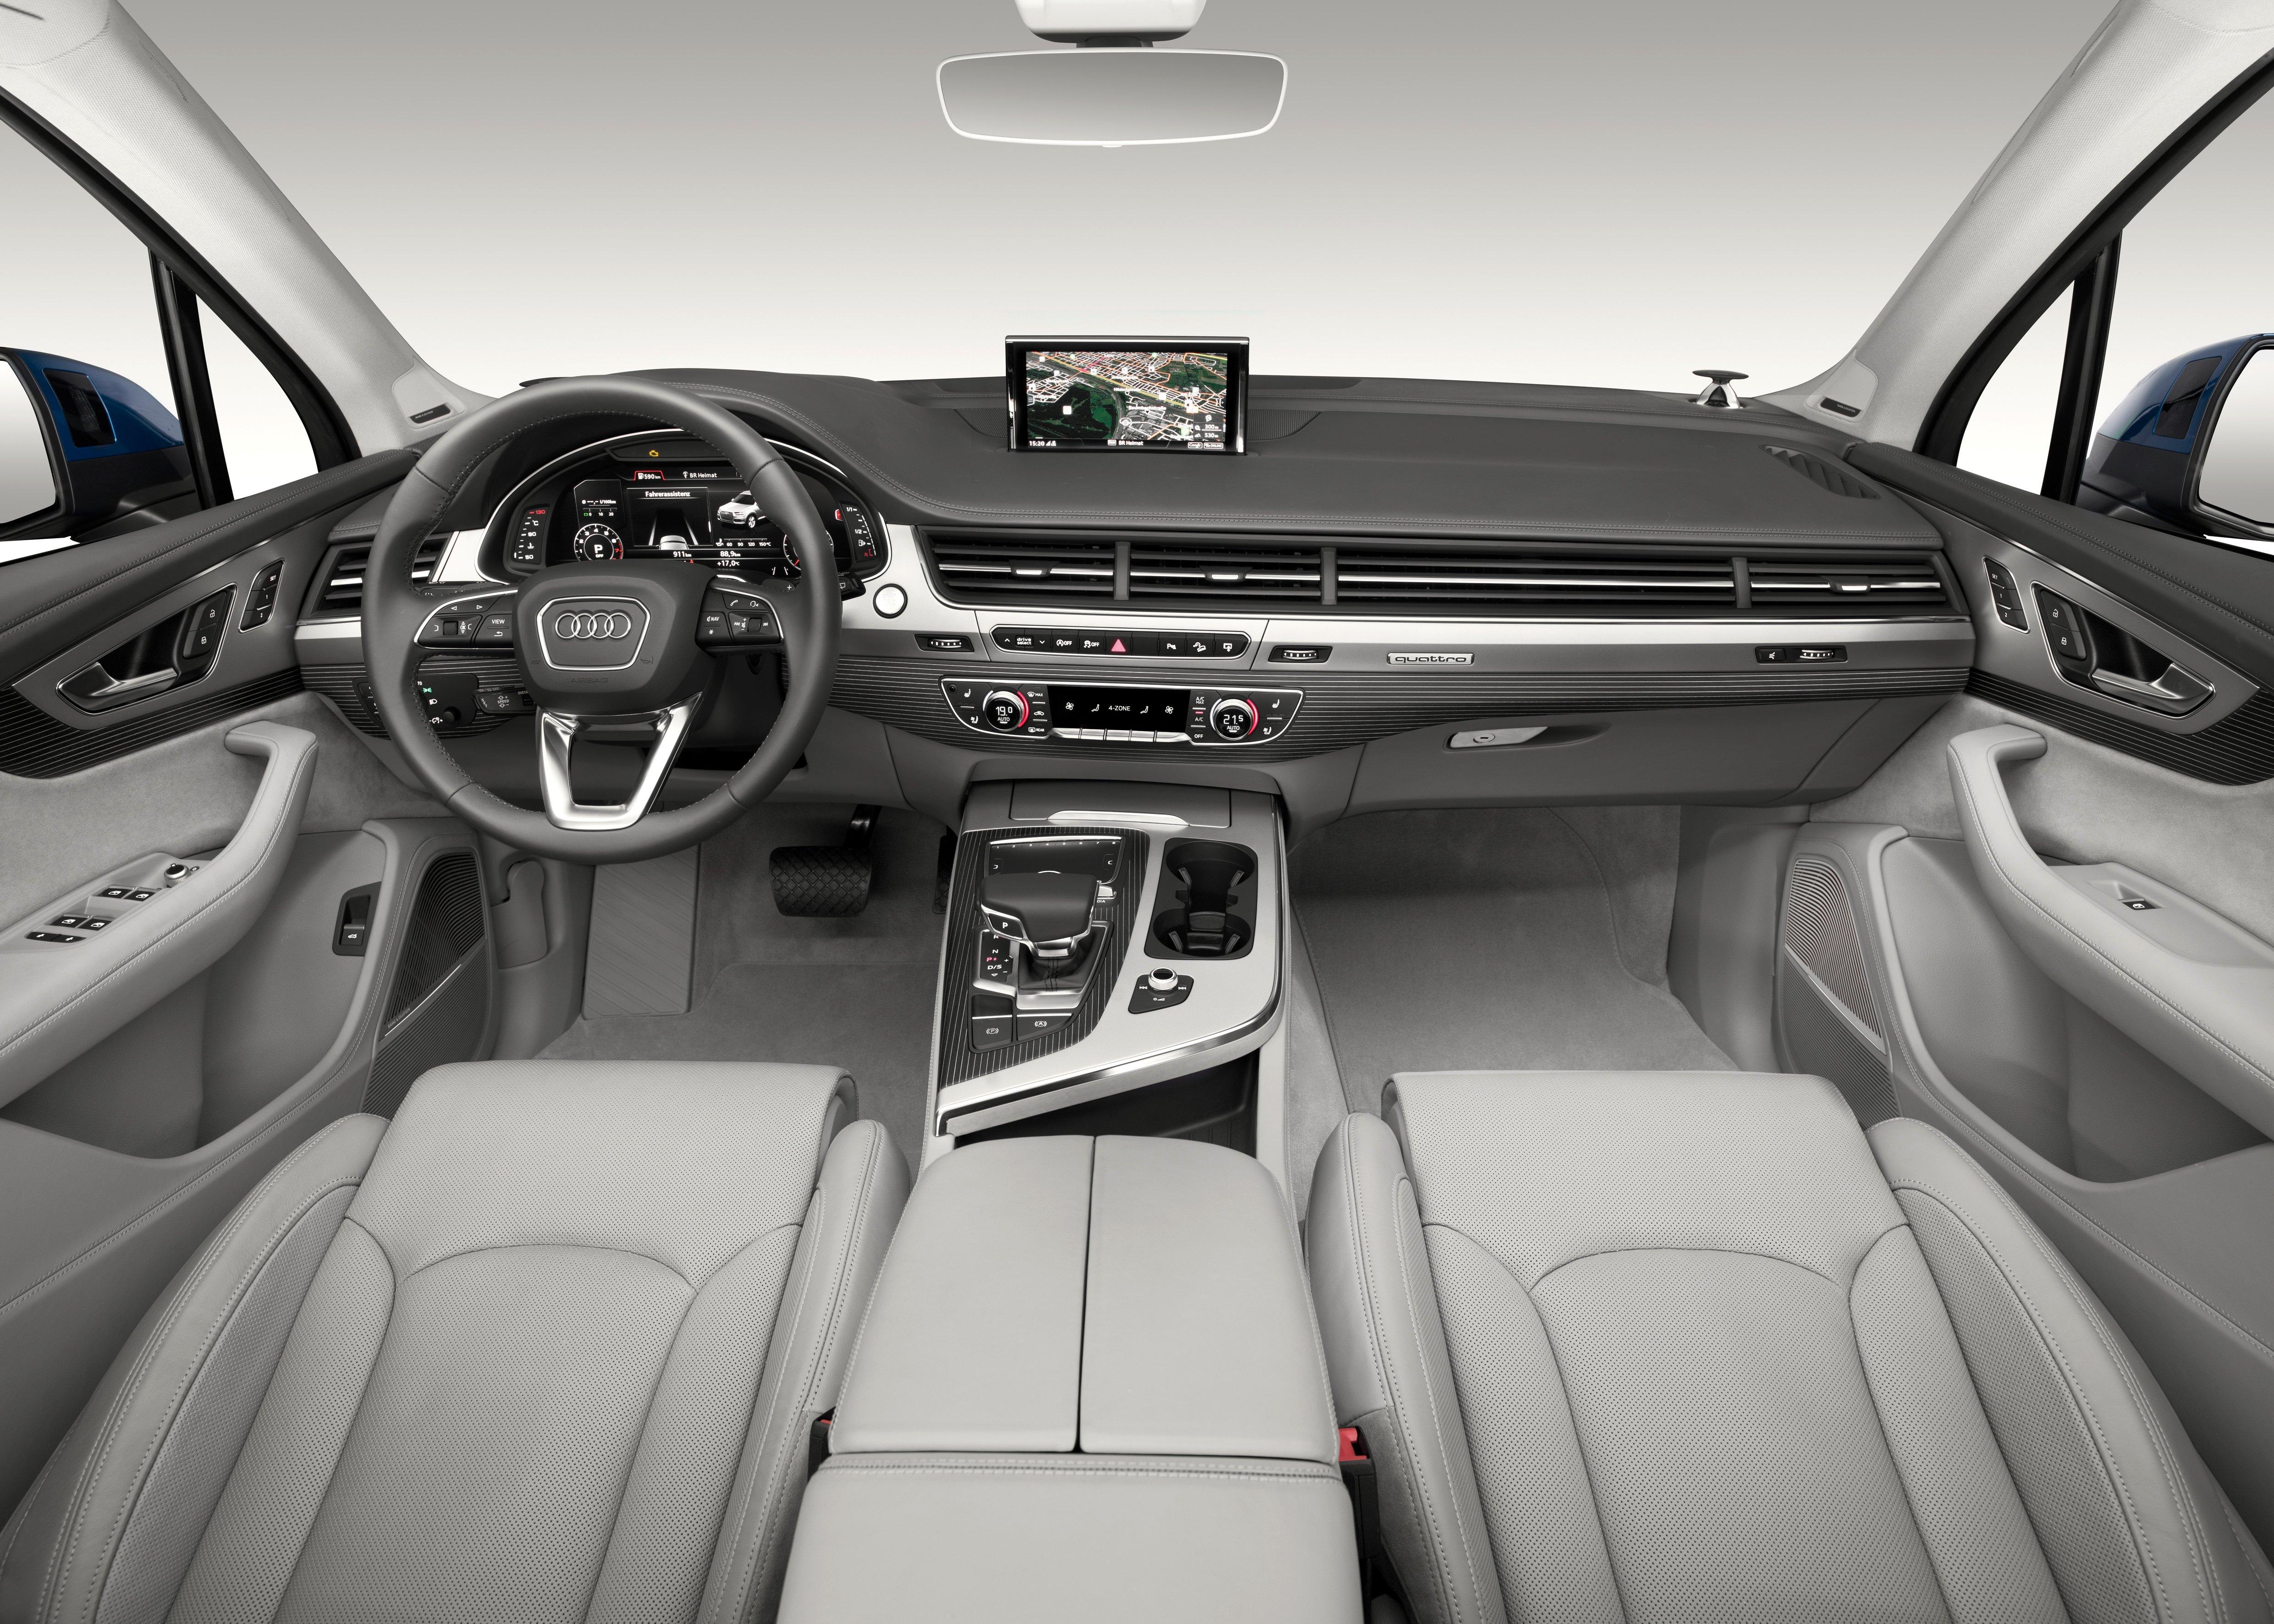 Audi Q7 Second Generation 7 Seater Suv Debuts Paul Tan